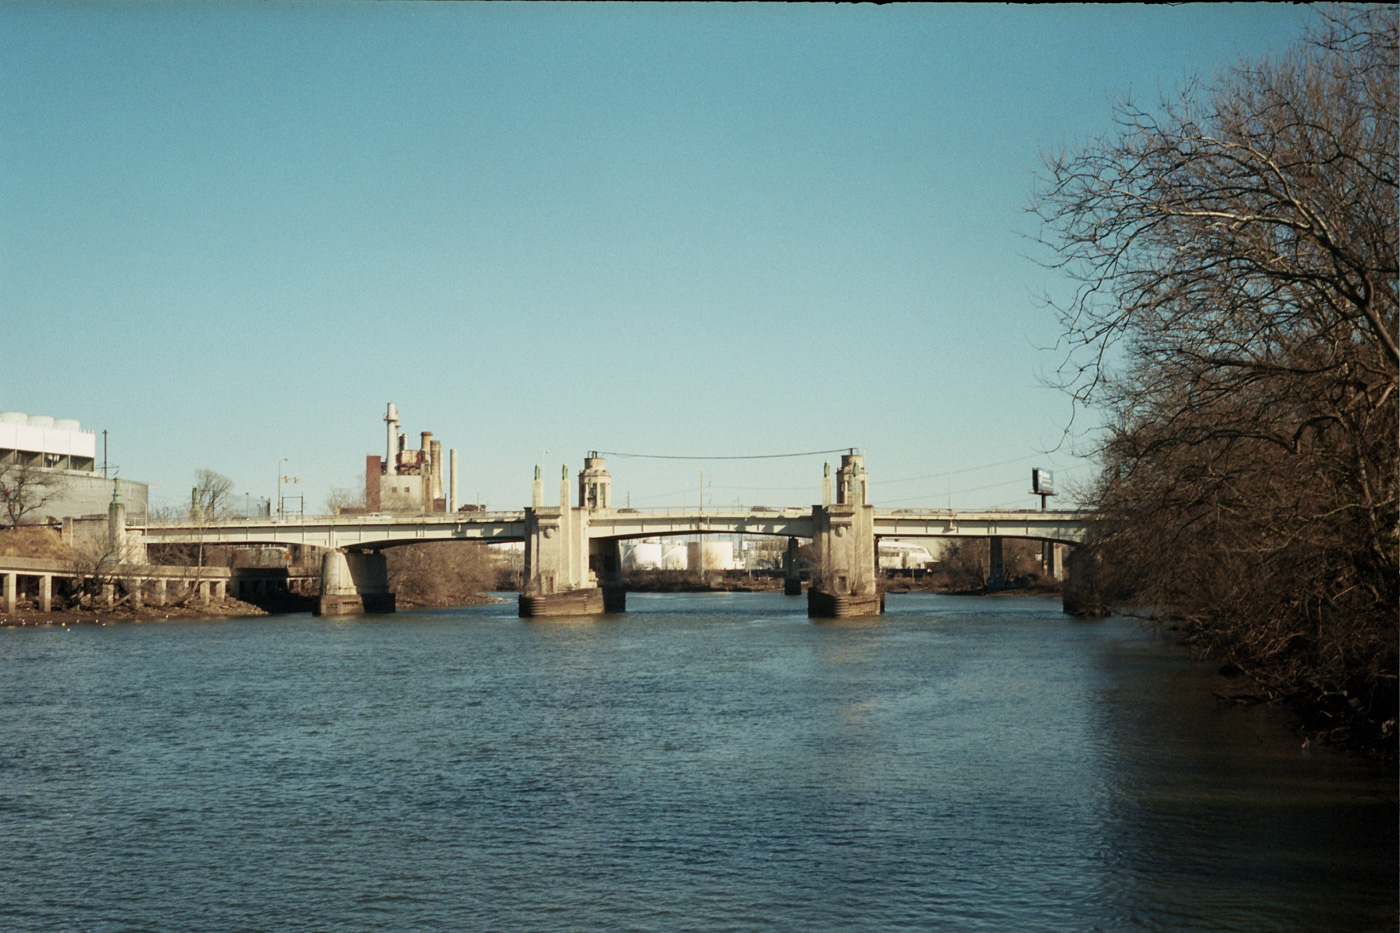 View of the 34th Street Bridge